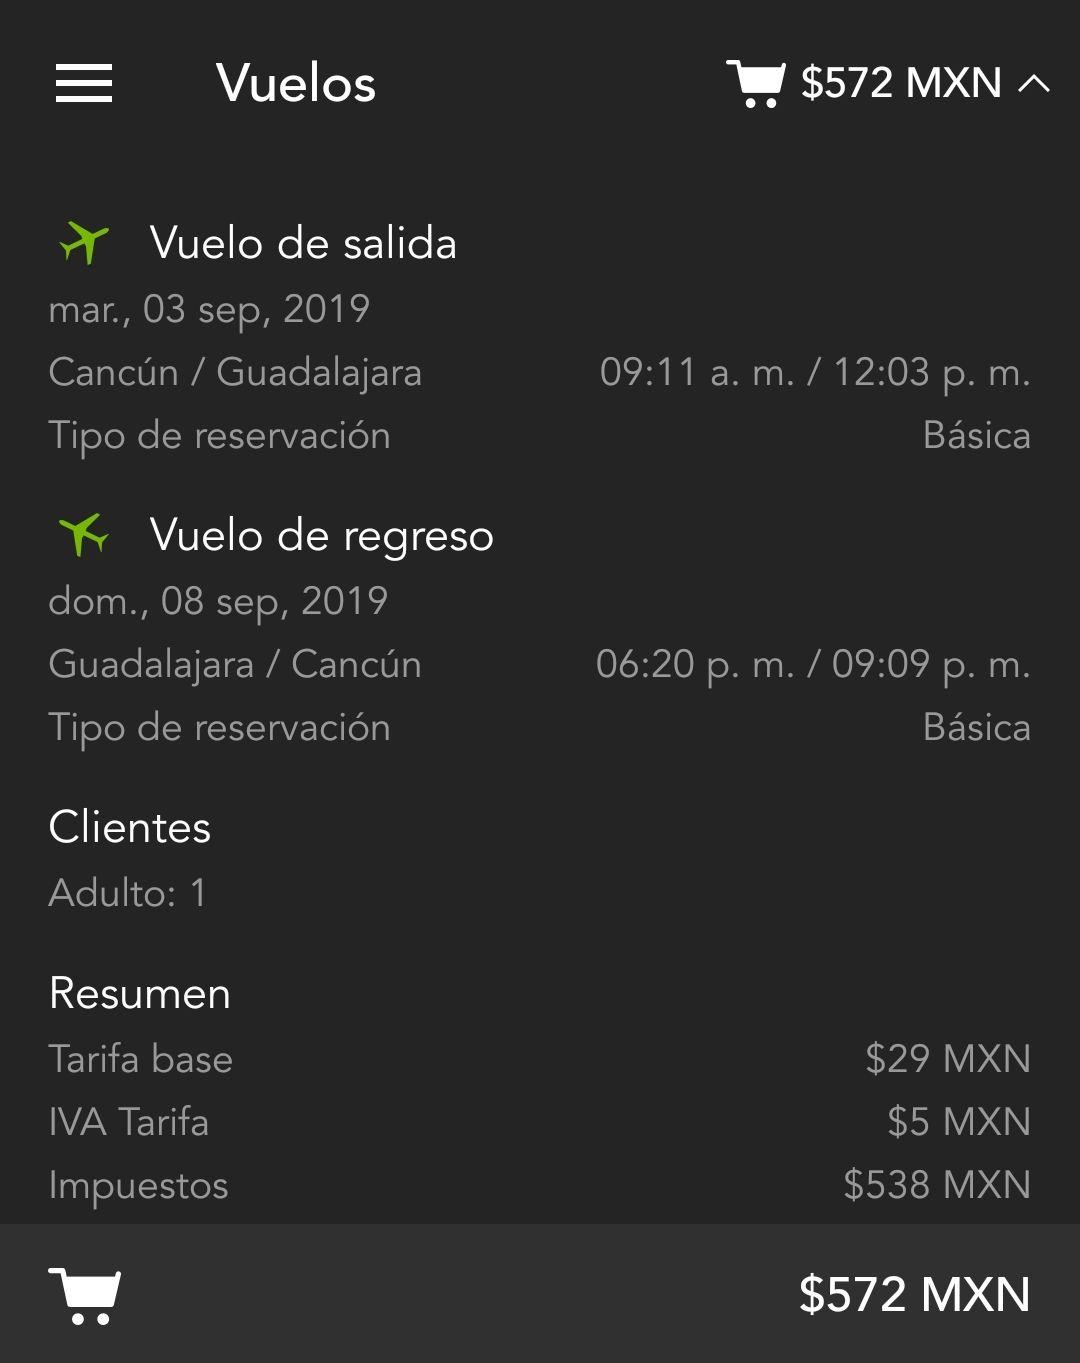 Volaris: Cancun-Guadalajara (572 pesos redondo)